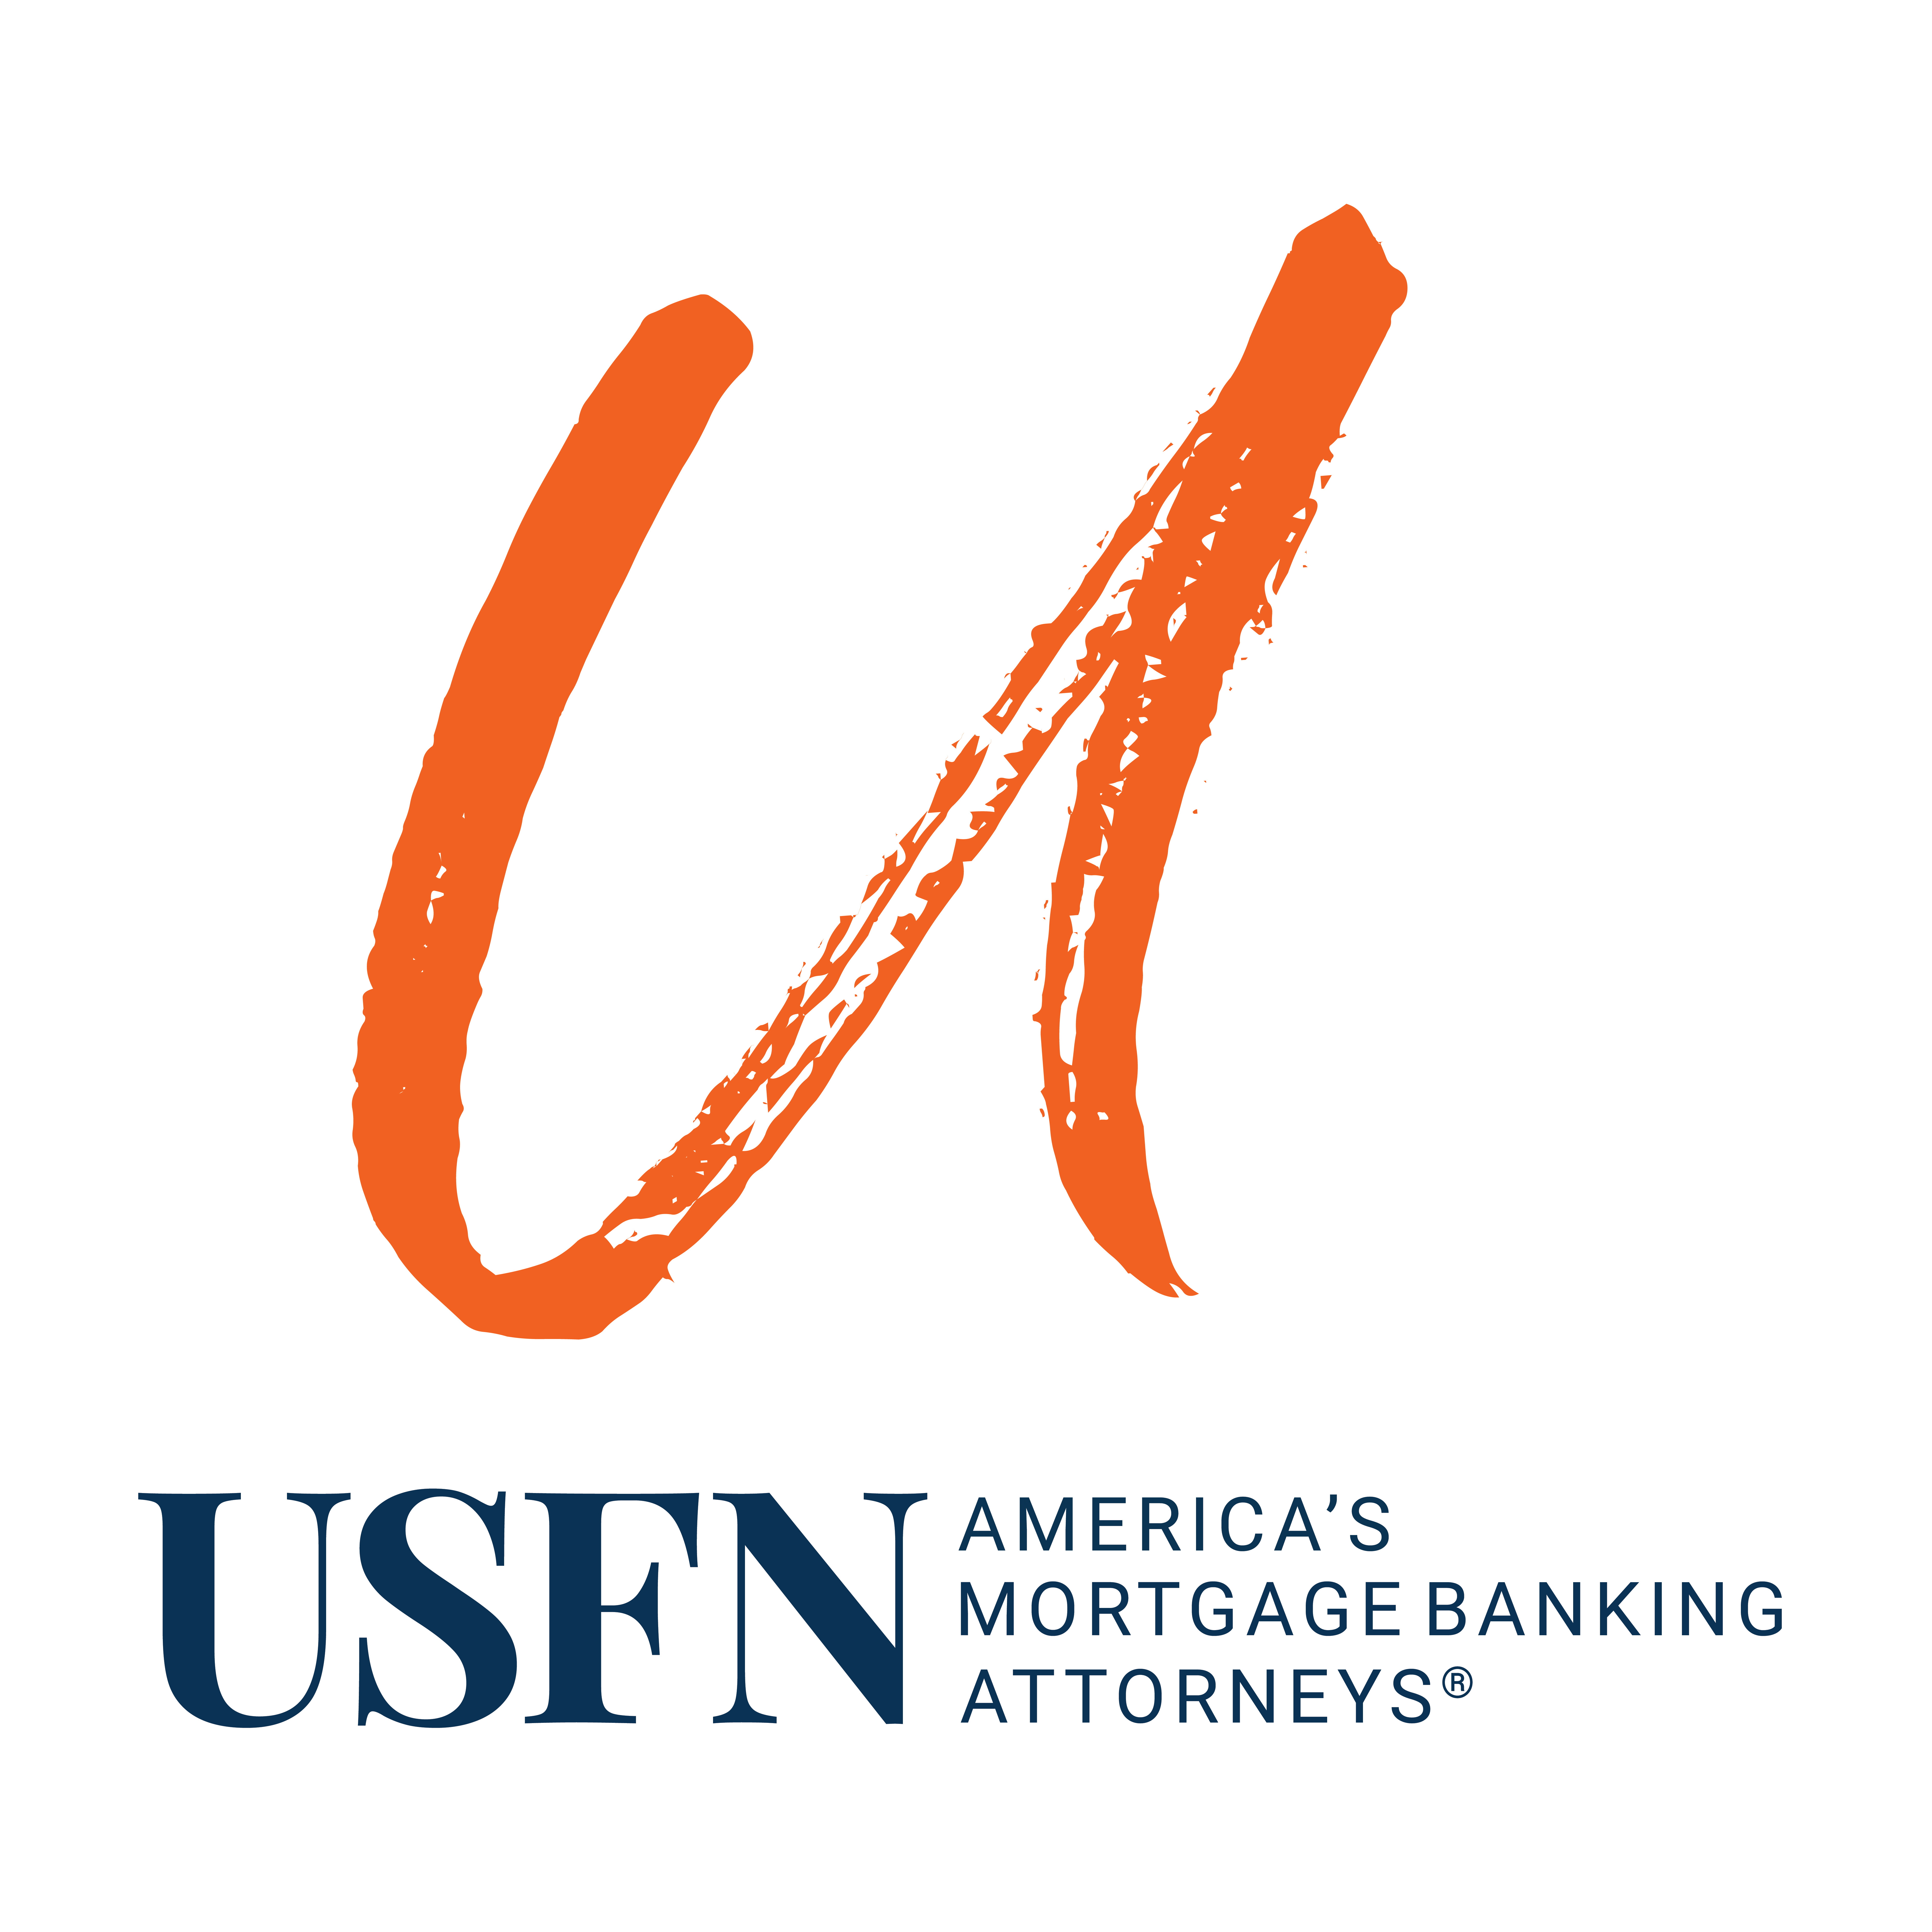 USFN's JobMart